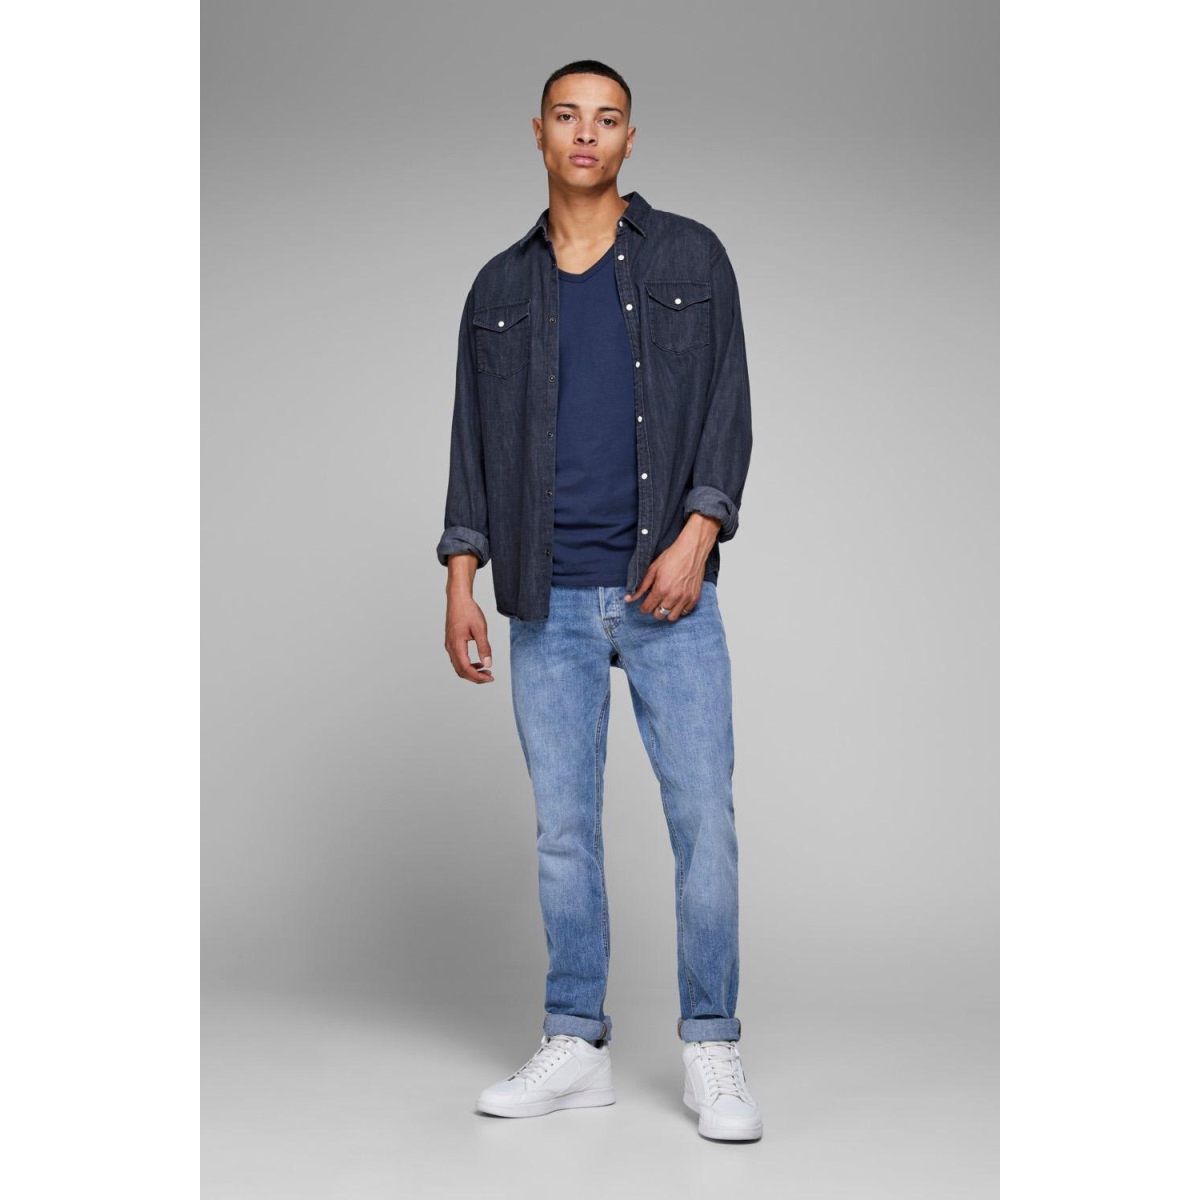 basic v-neck tee s/s noos 12059219 jack & jones t-shirt navy blue